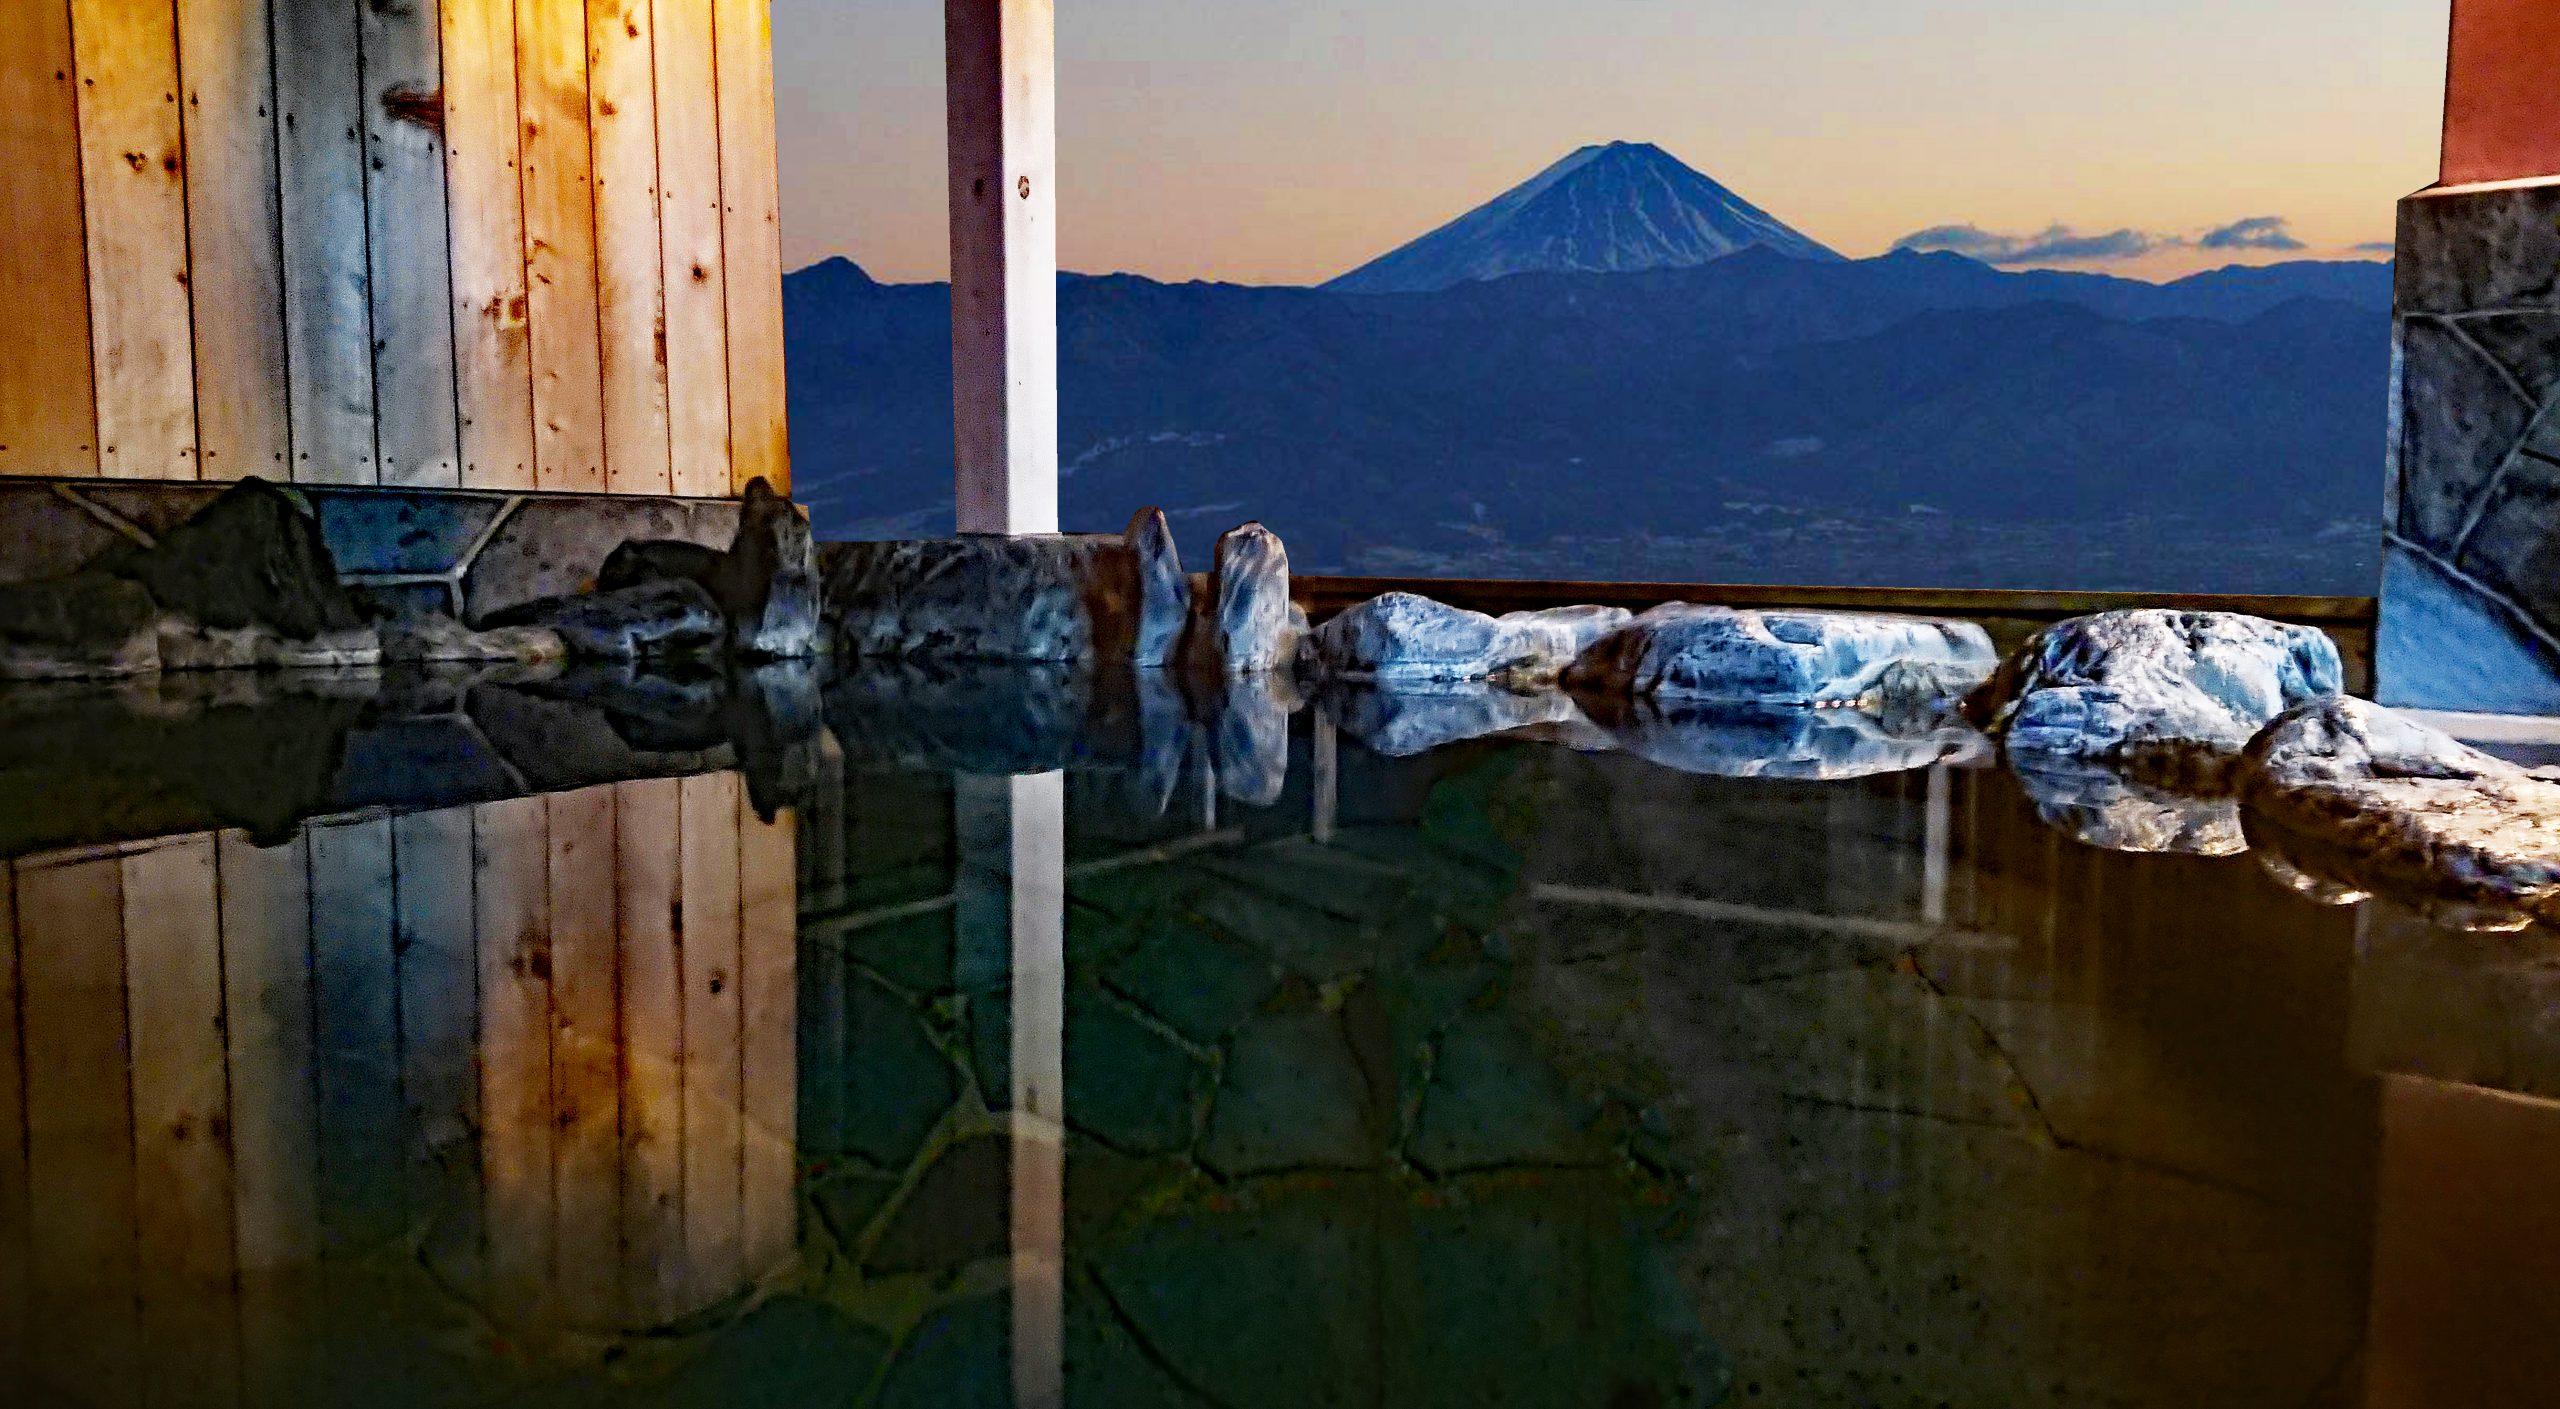 Fuji onsen